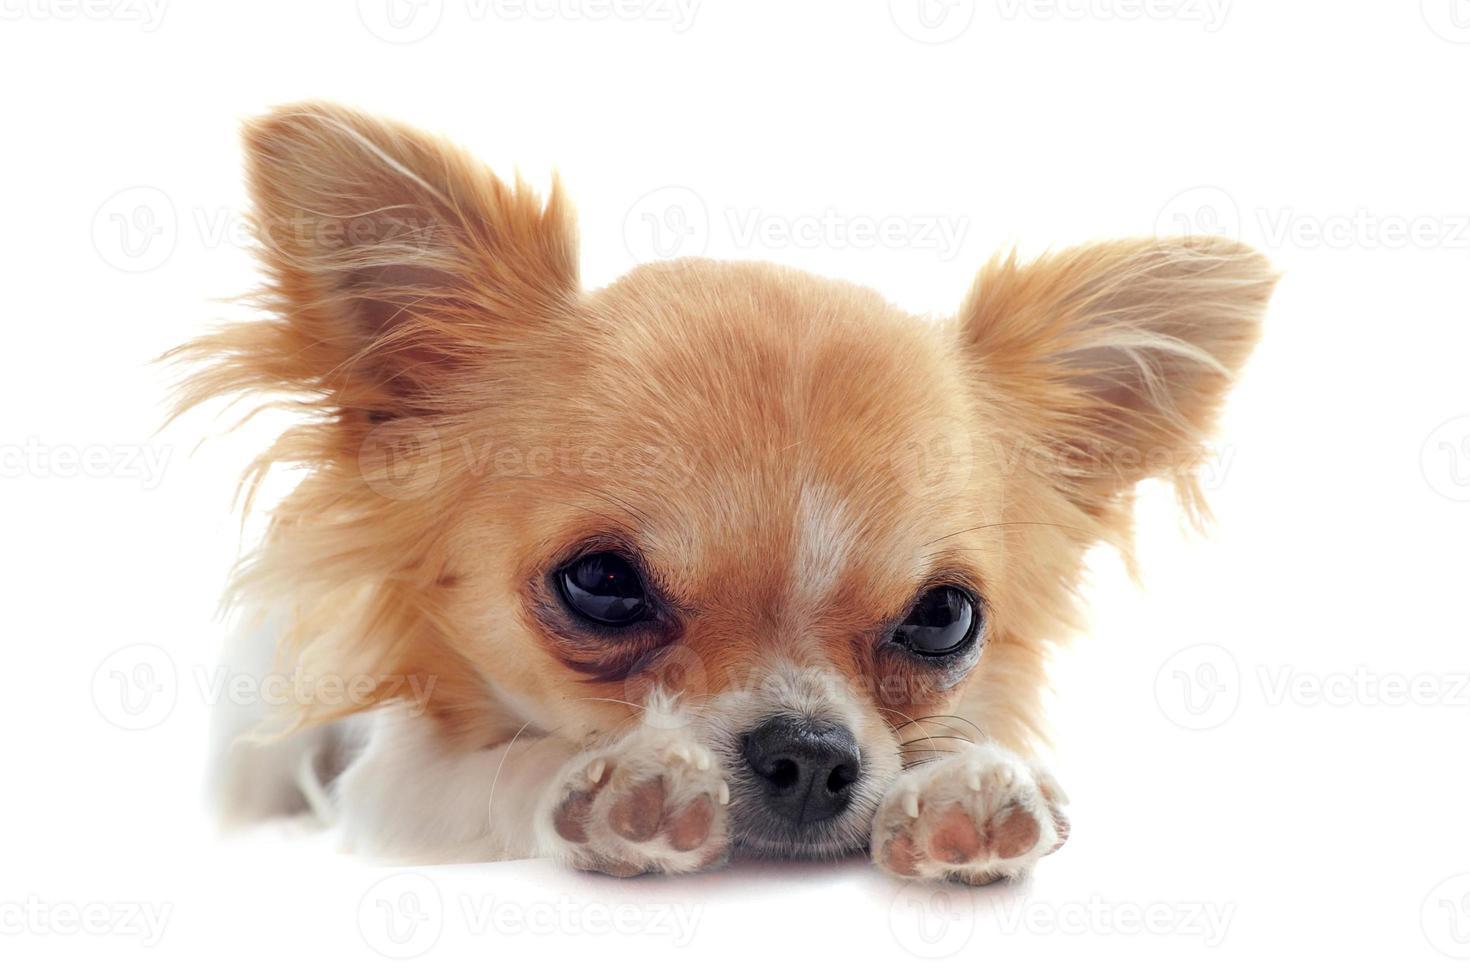 cachorro chihuahua cansado foto